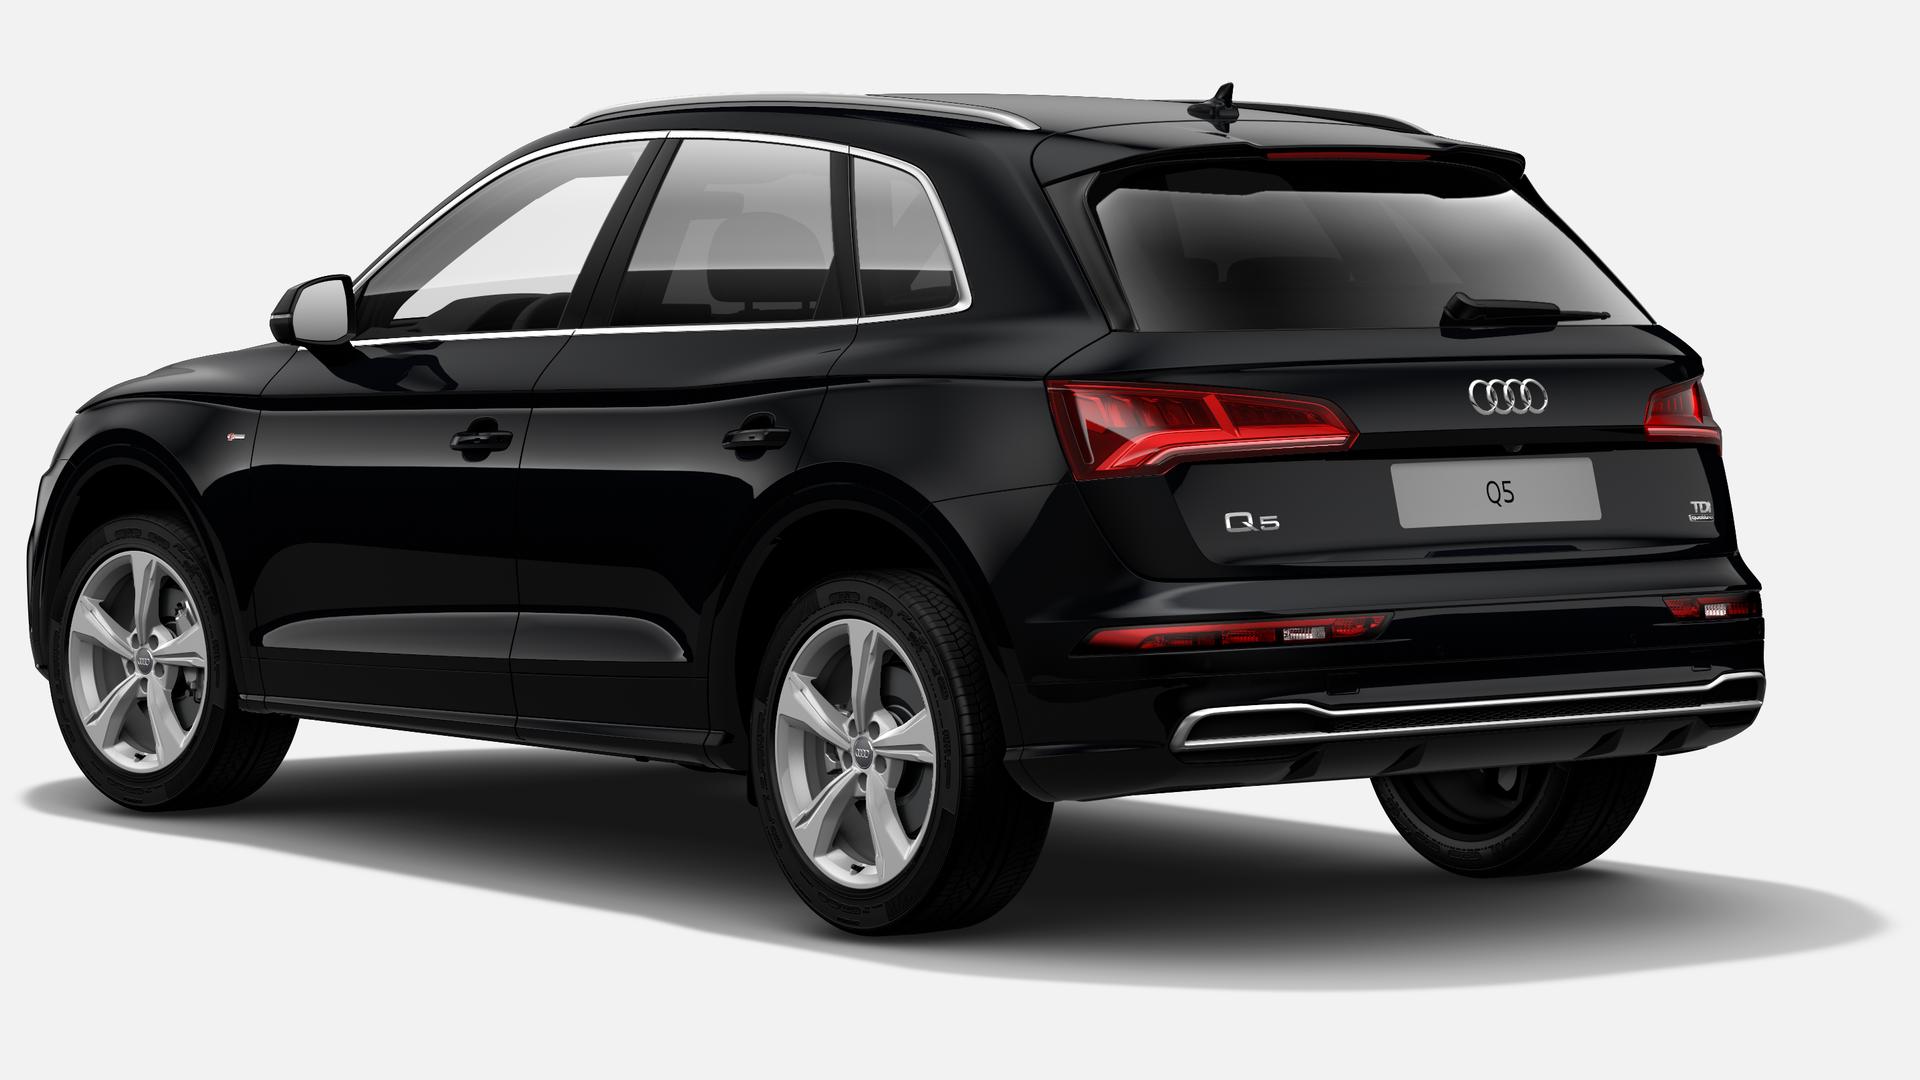 Audi Q5 2.0 TDI S Line Quattro S Tronic 140 kW (190 CV)